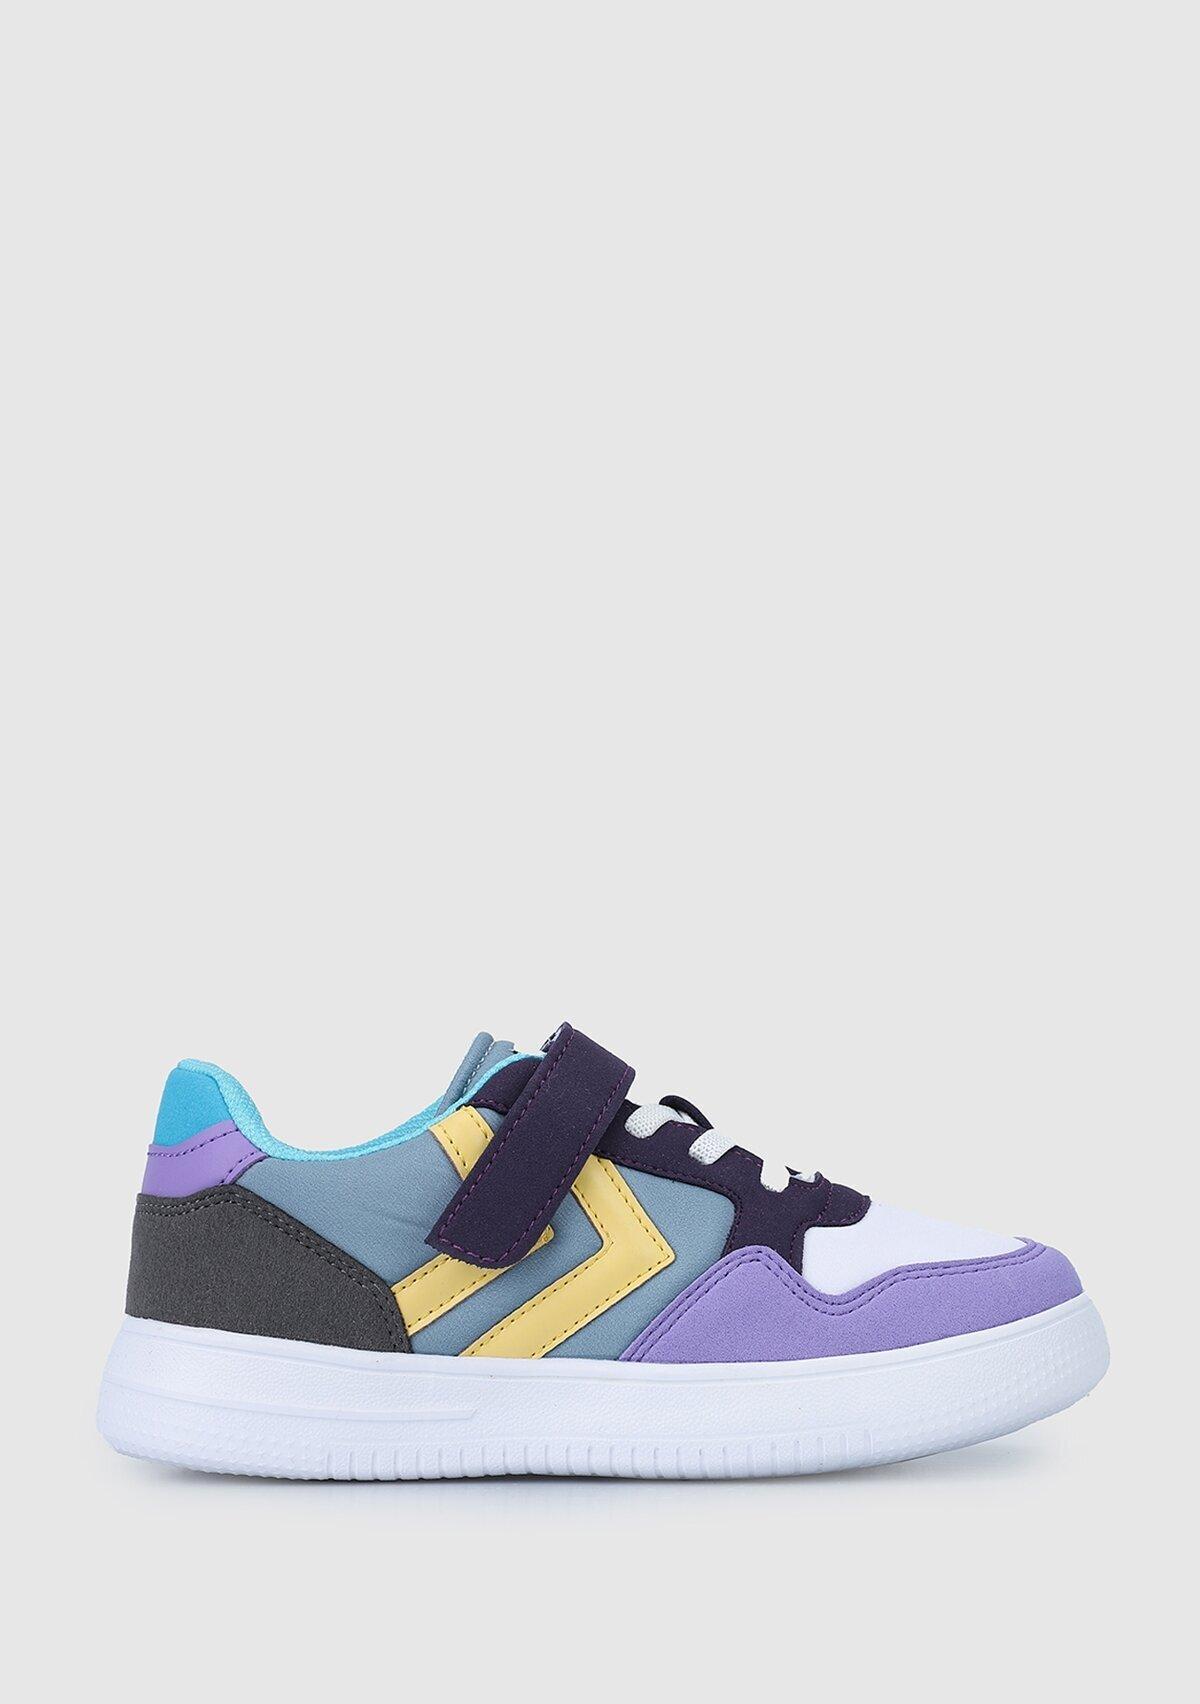 resm HML Camder jr Multi Unisex Sneaker 212668-7985